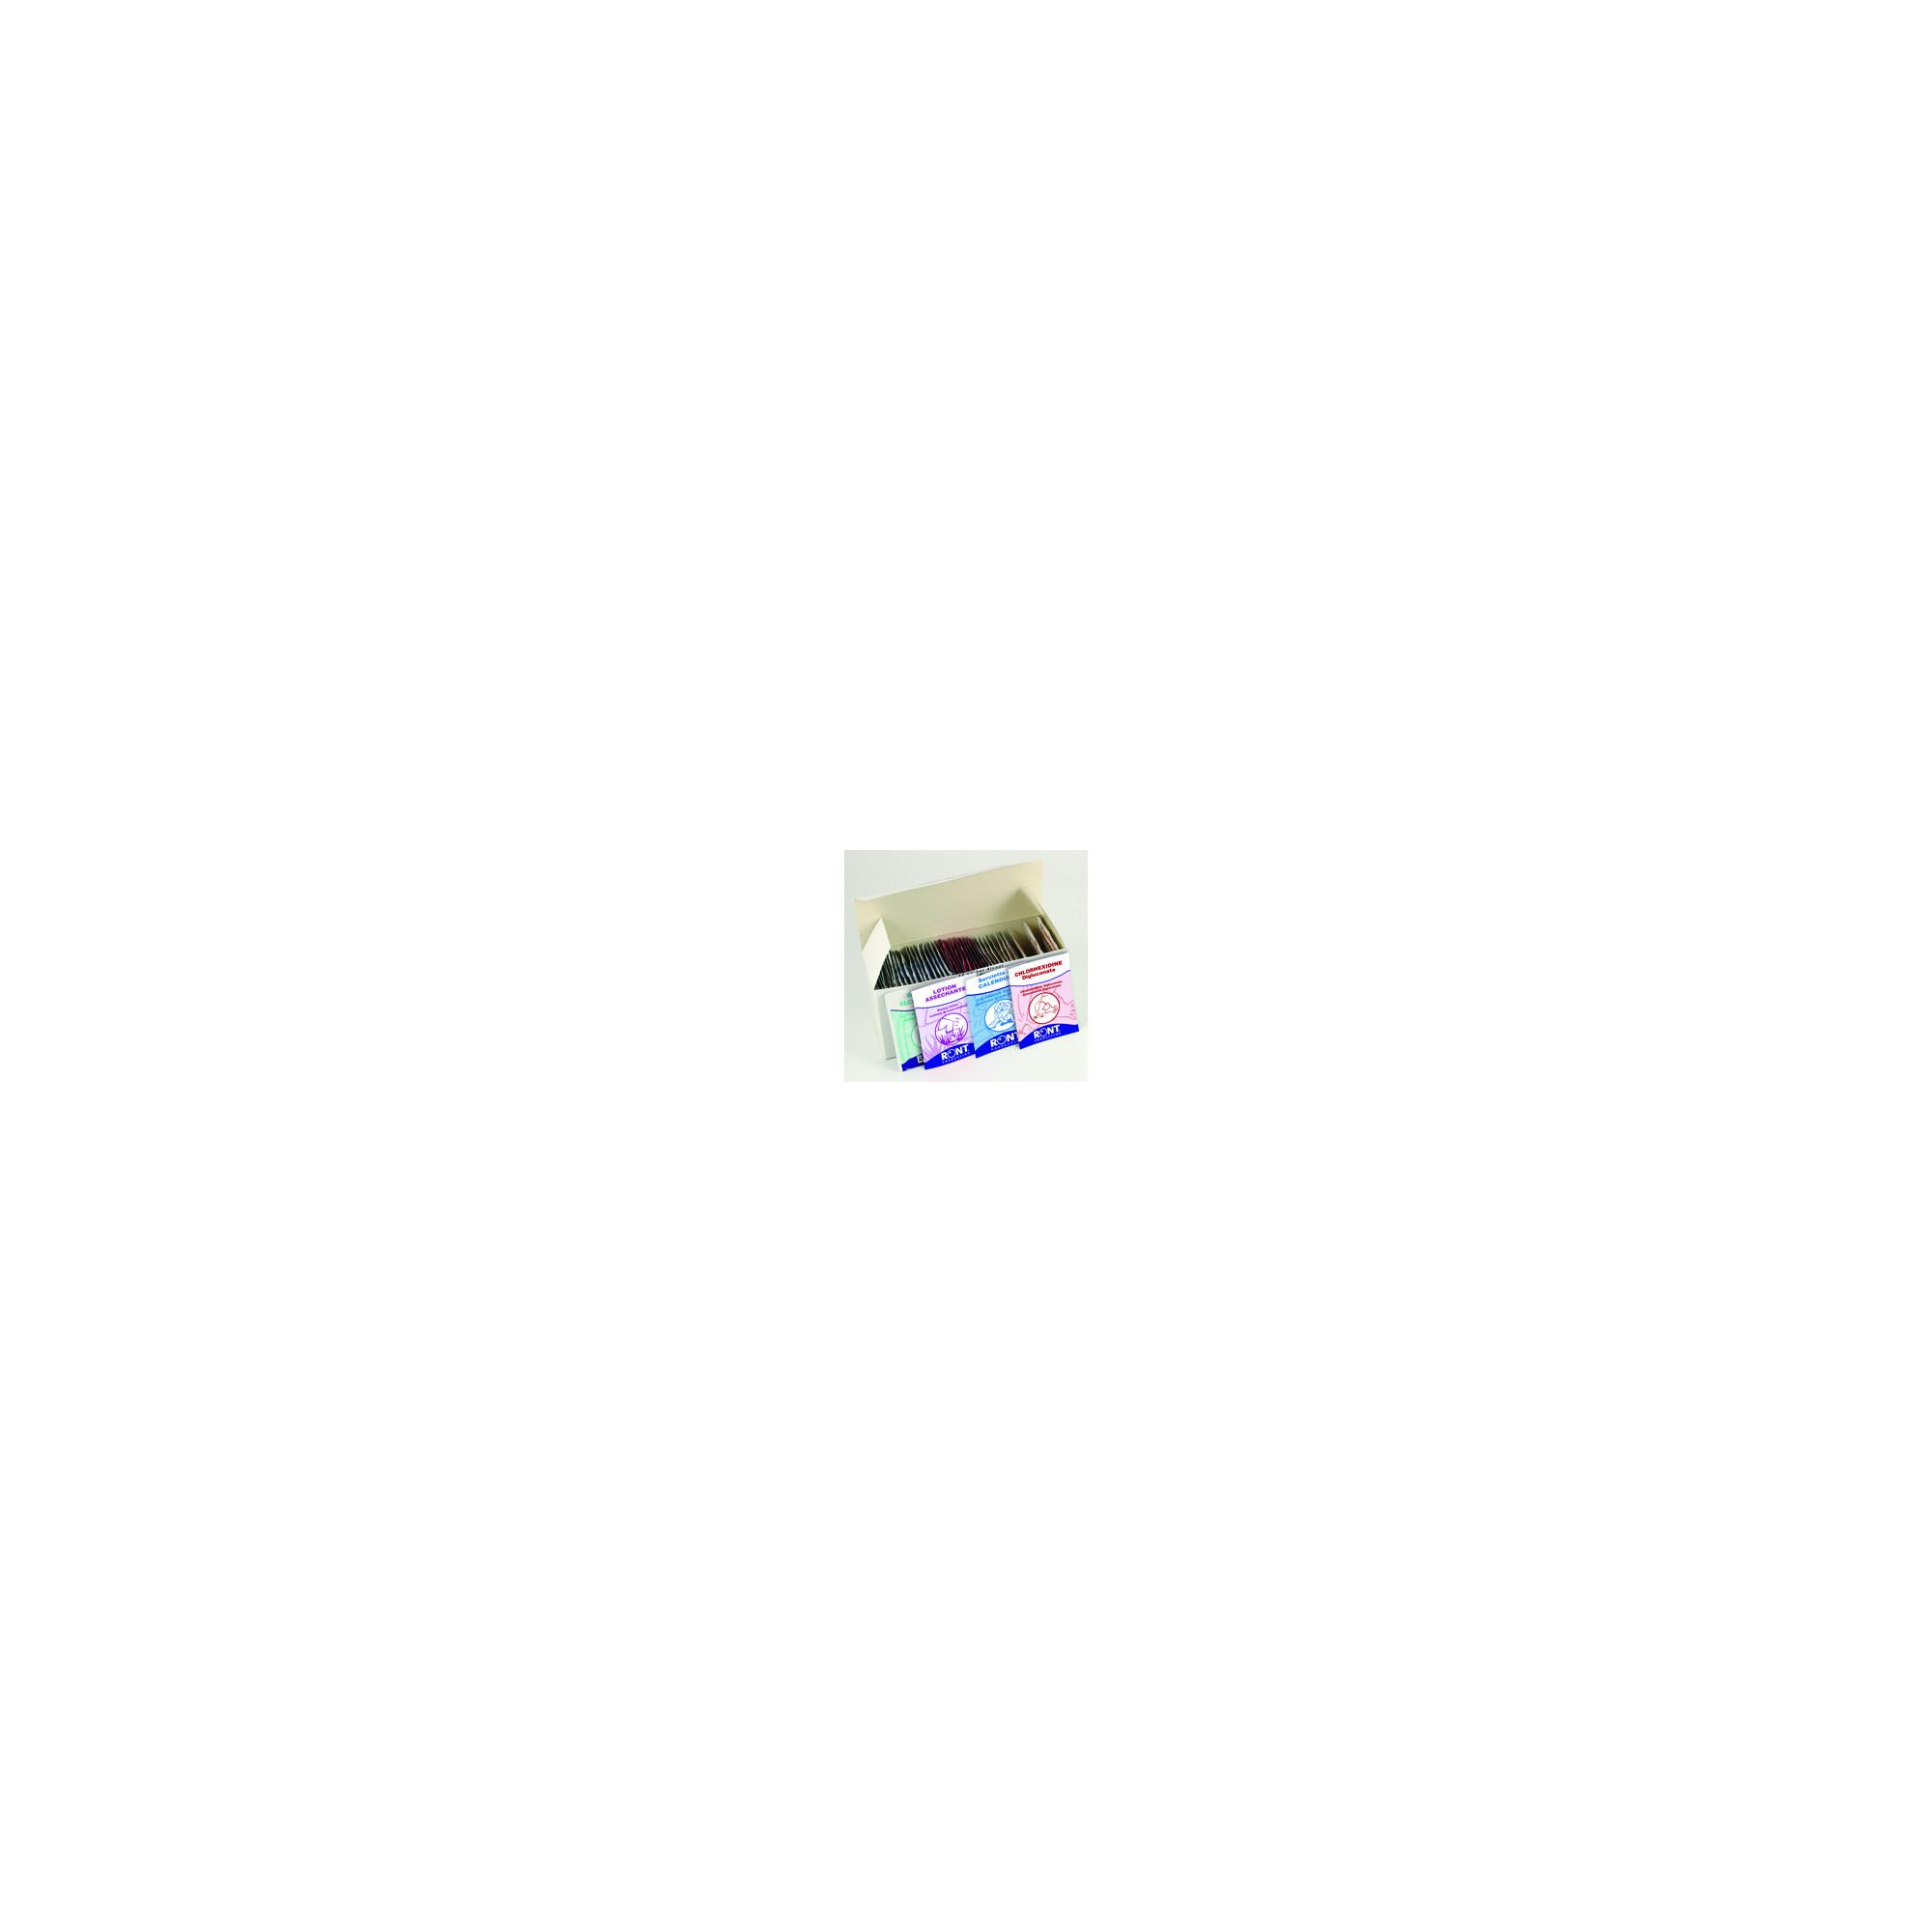 Boîte de 48 sachets panachés - 12 x Alcool - 12 x chlorhexidine - 12 x calendula - 12 x asséchante - Ront